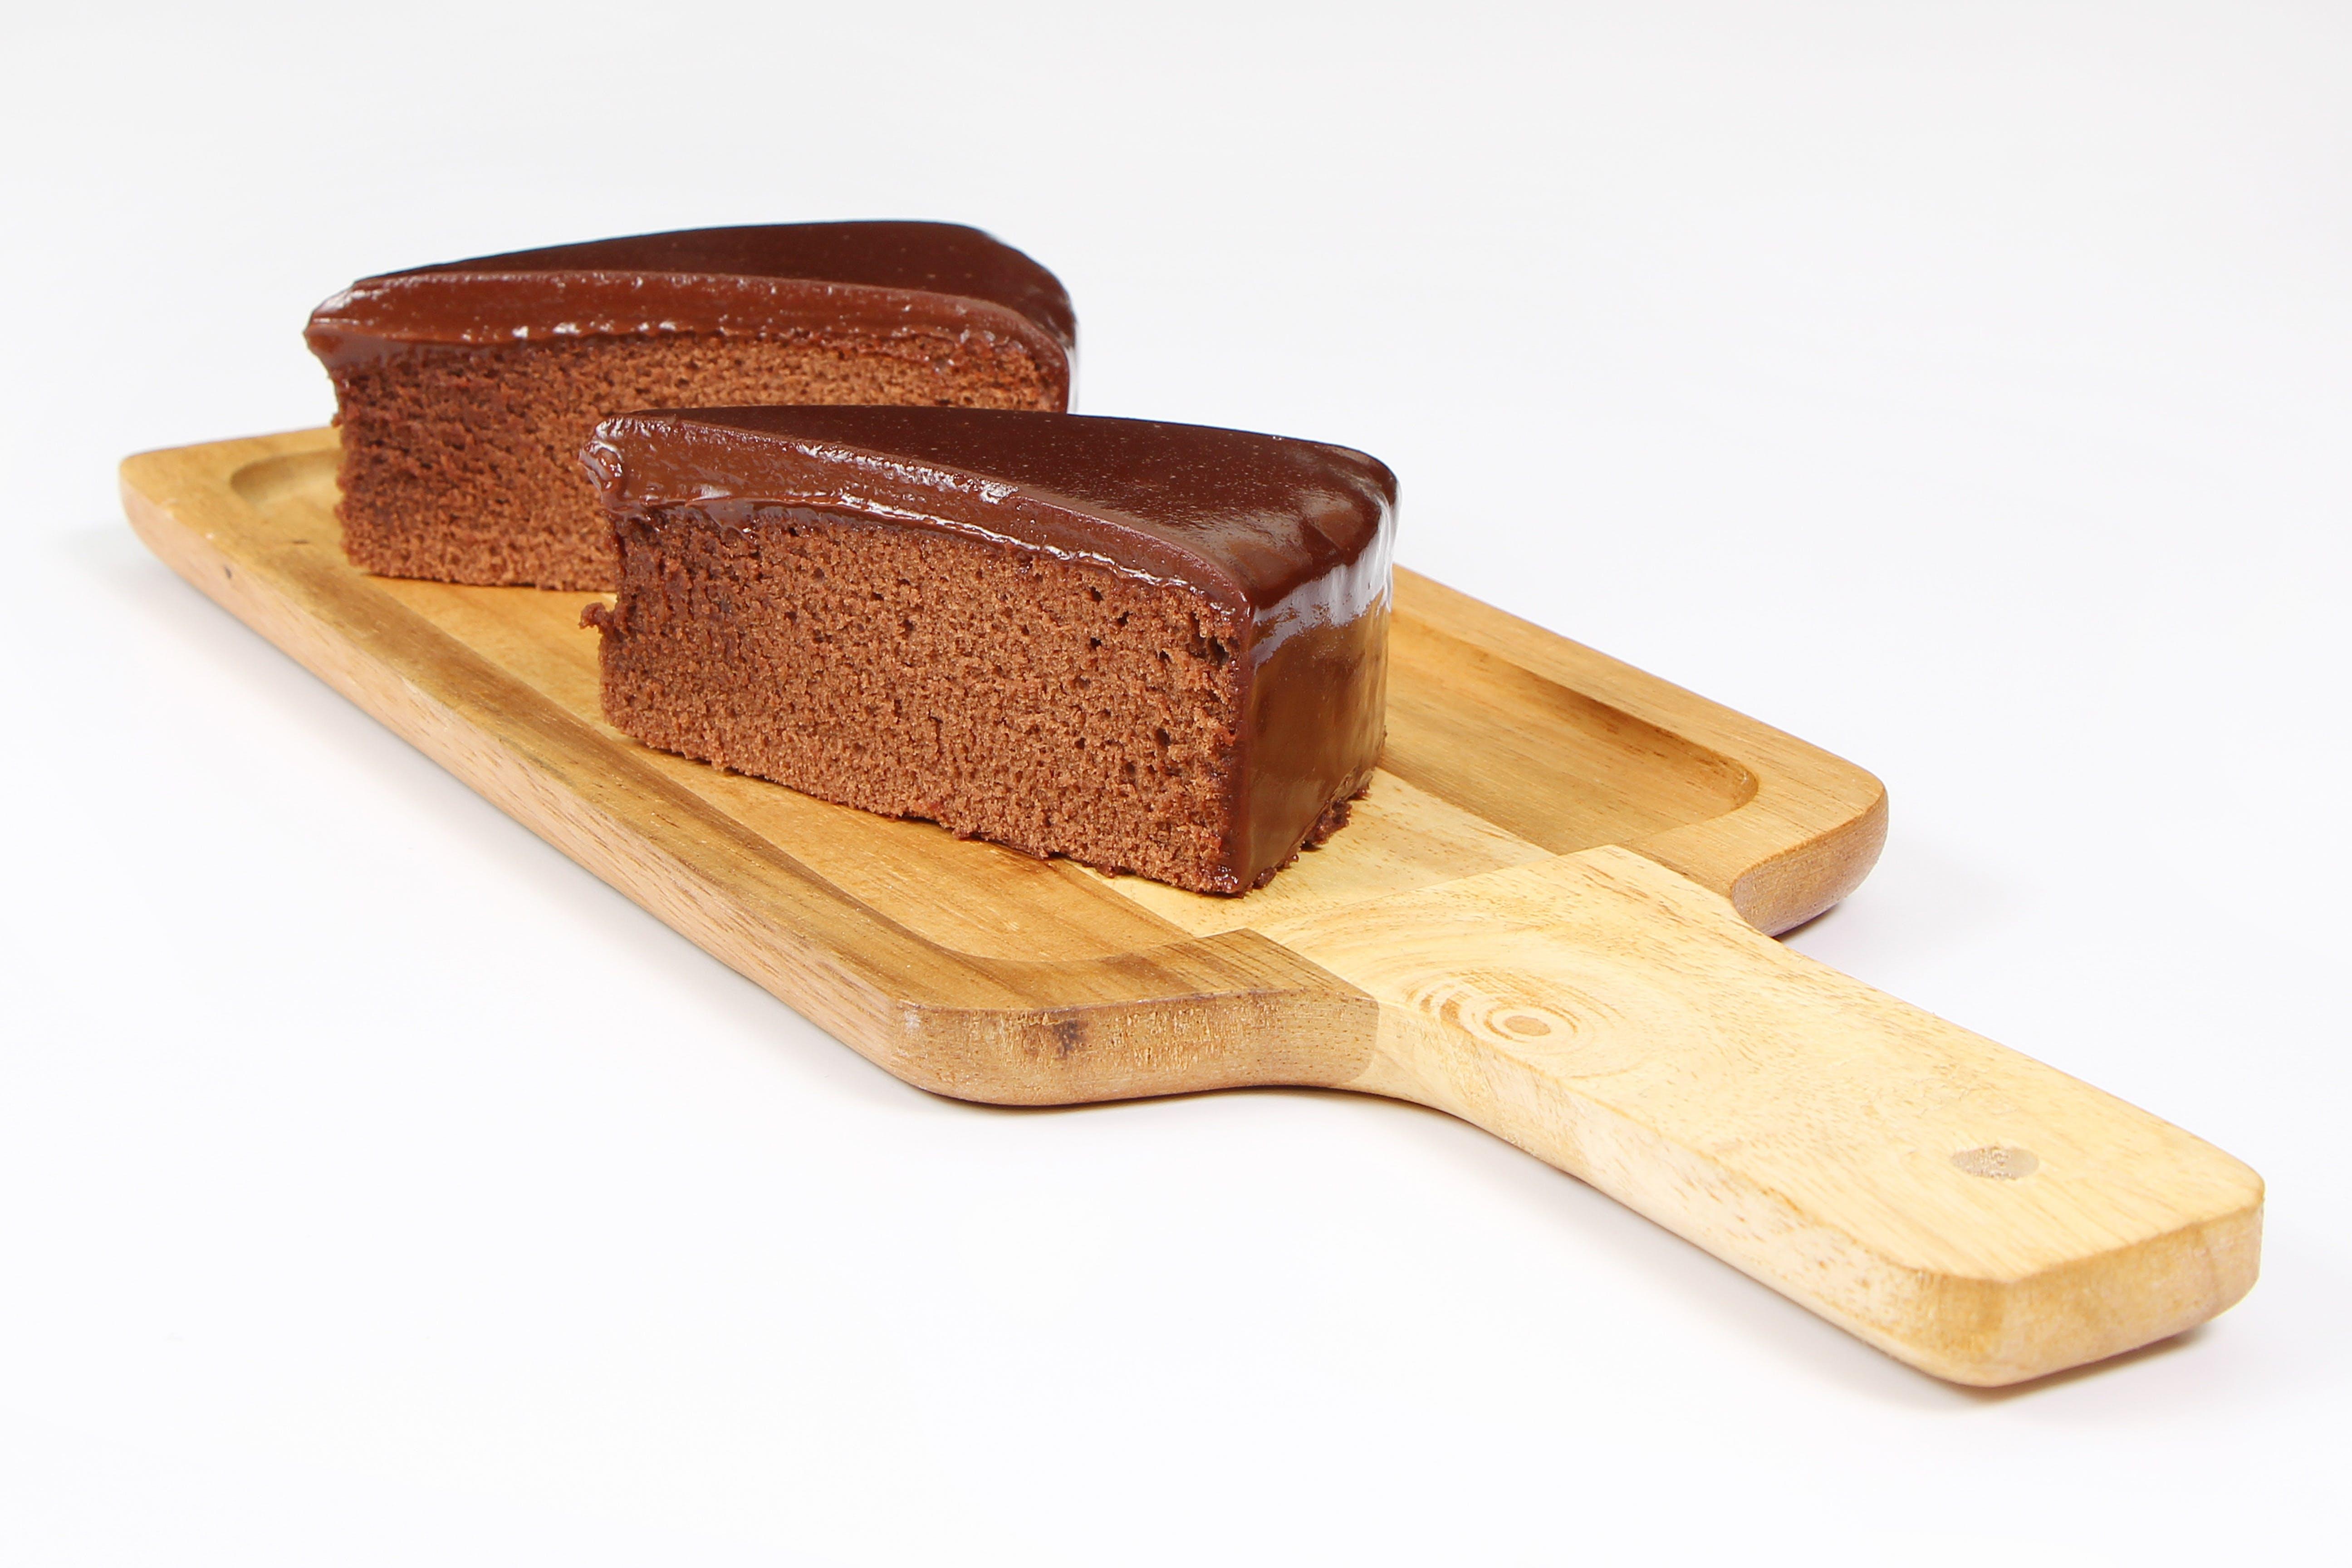 Free stock photo of bread, food, bakery, eat